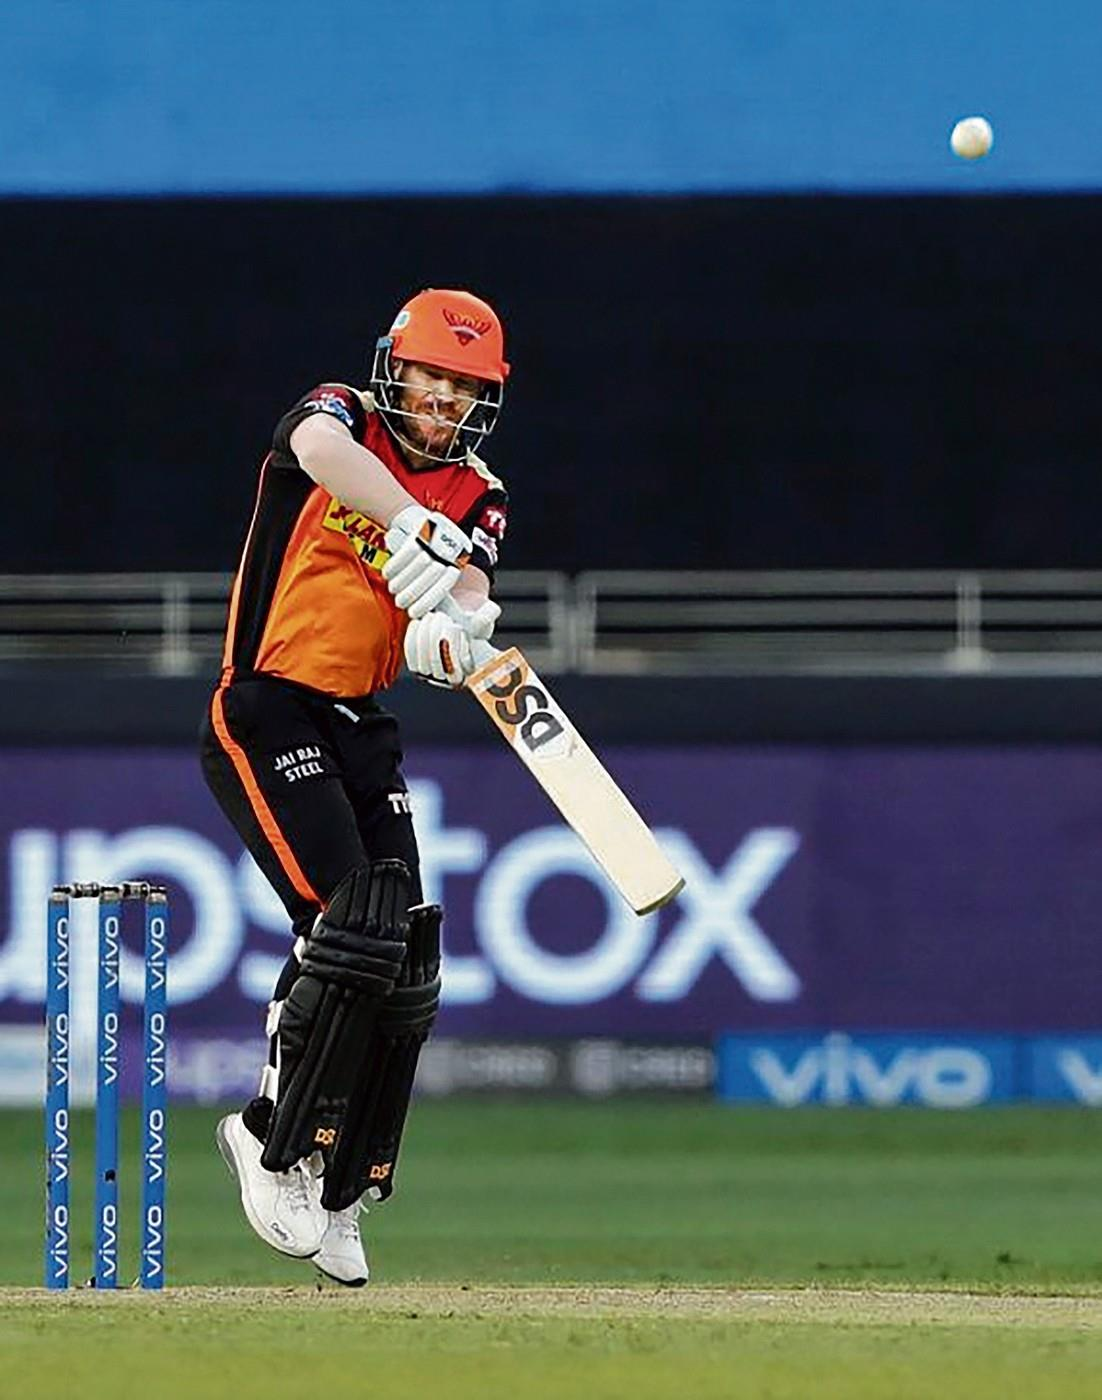 8 विकेट से जीती दिल्ली कैपिटल्स